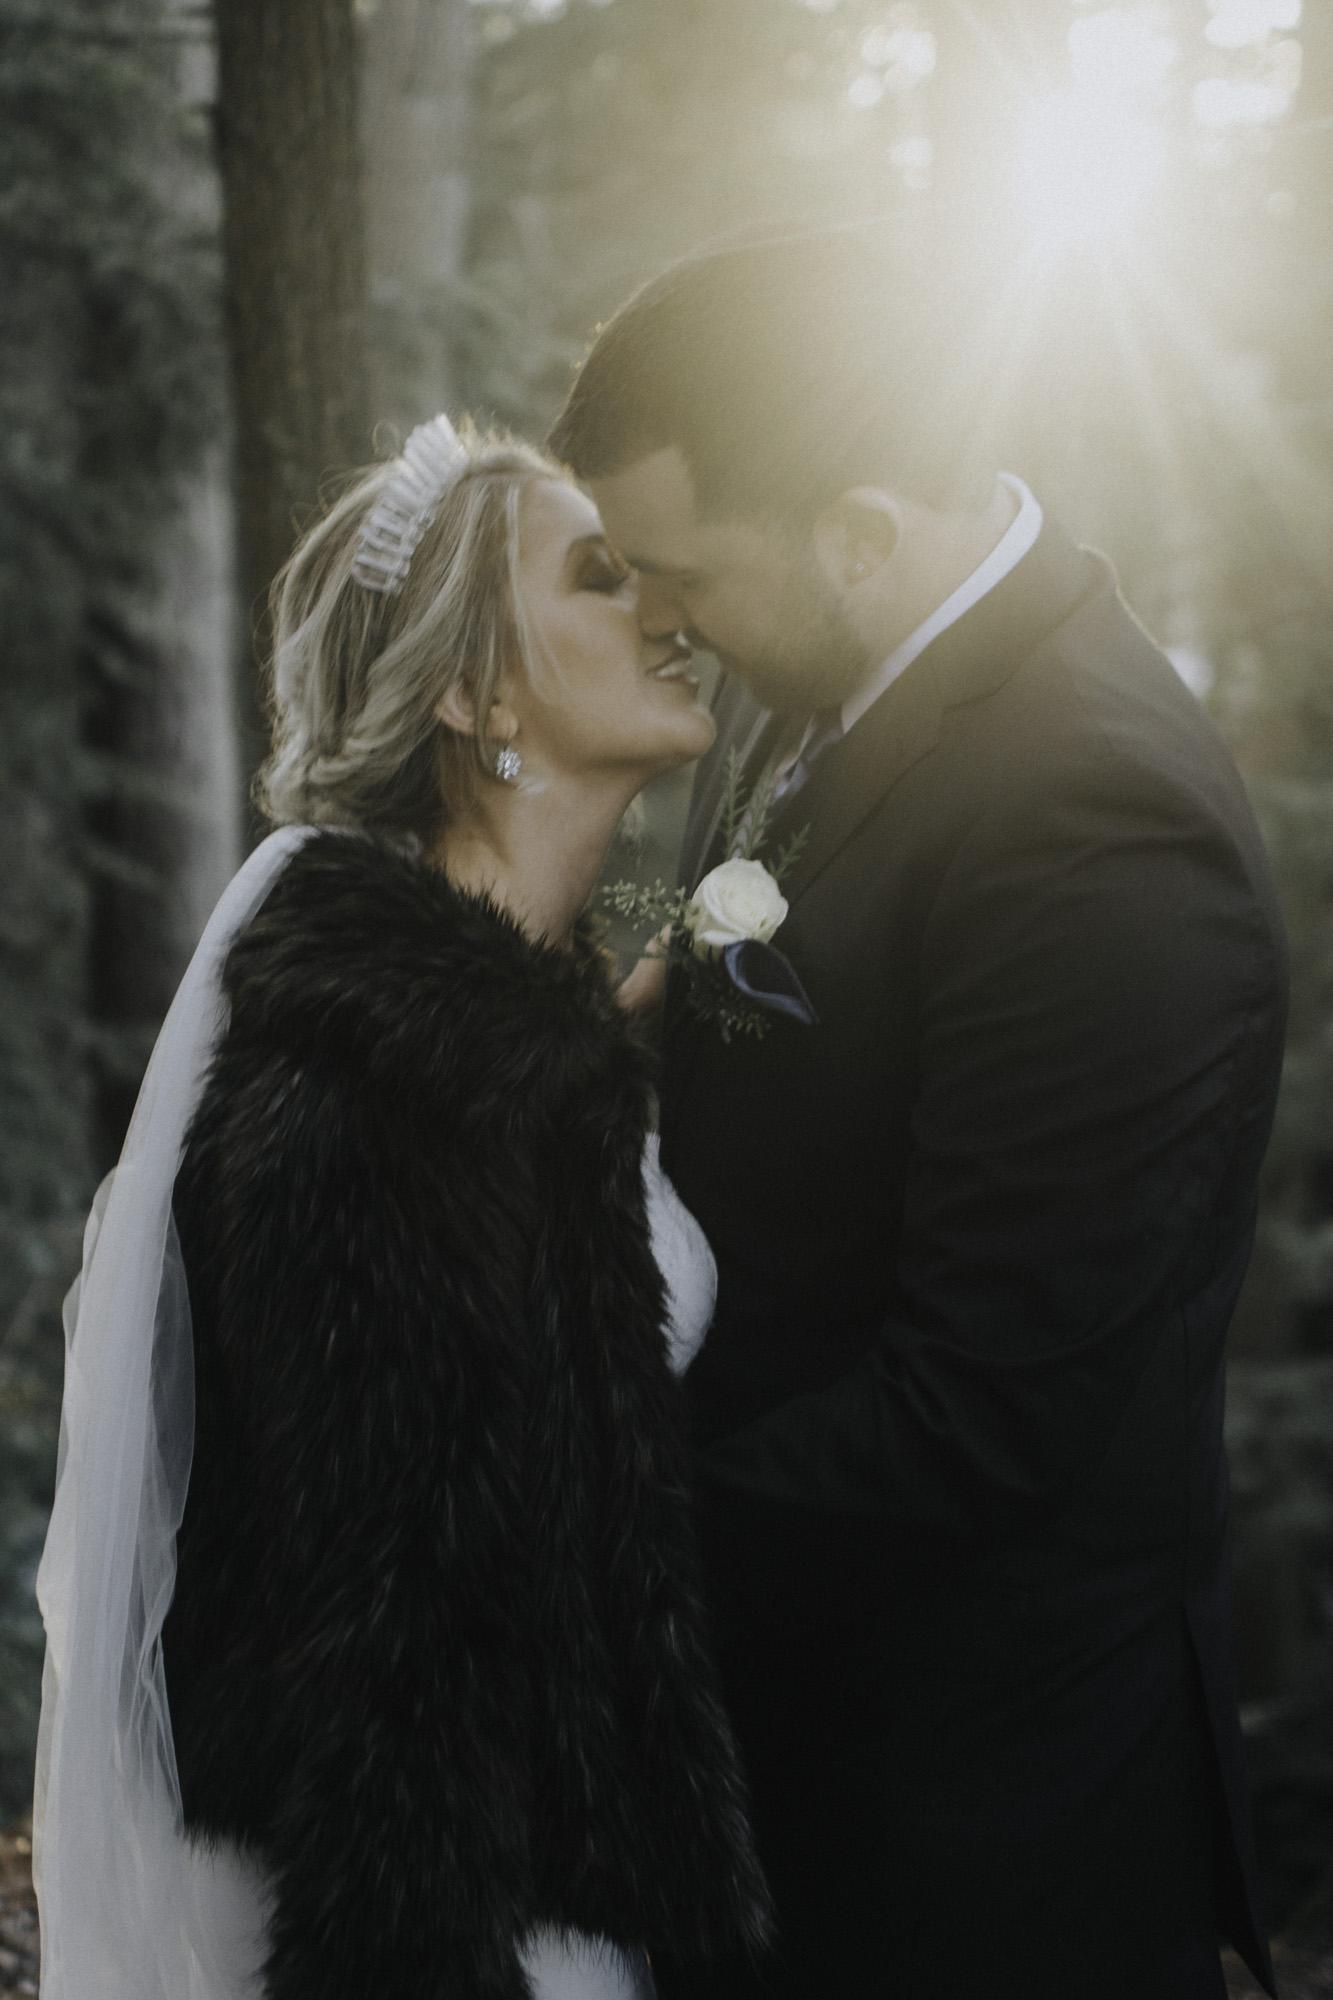 Cate_Ann_Photography_Dayton_Ohio_Wedding_Elopement_And_Engagement_PhotographerDSC_6081.jpg